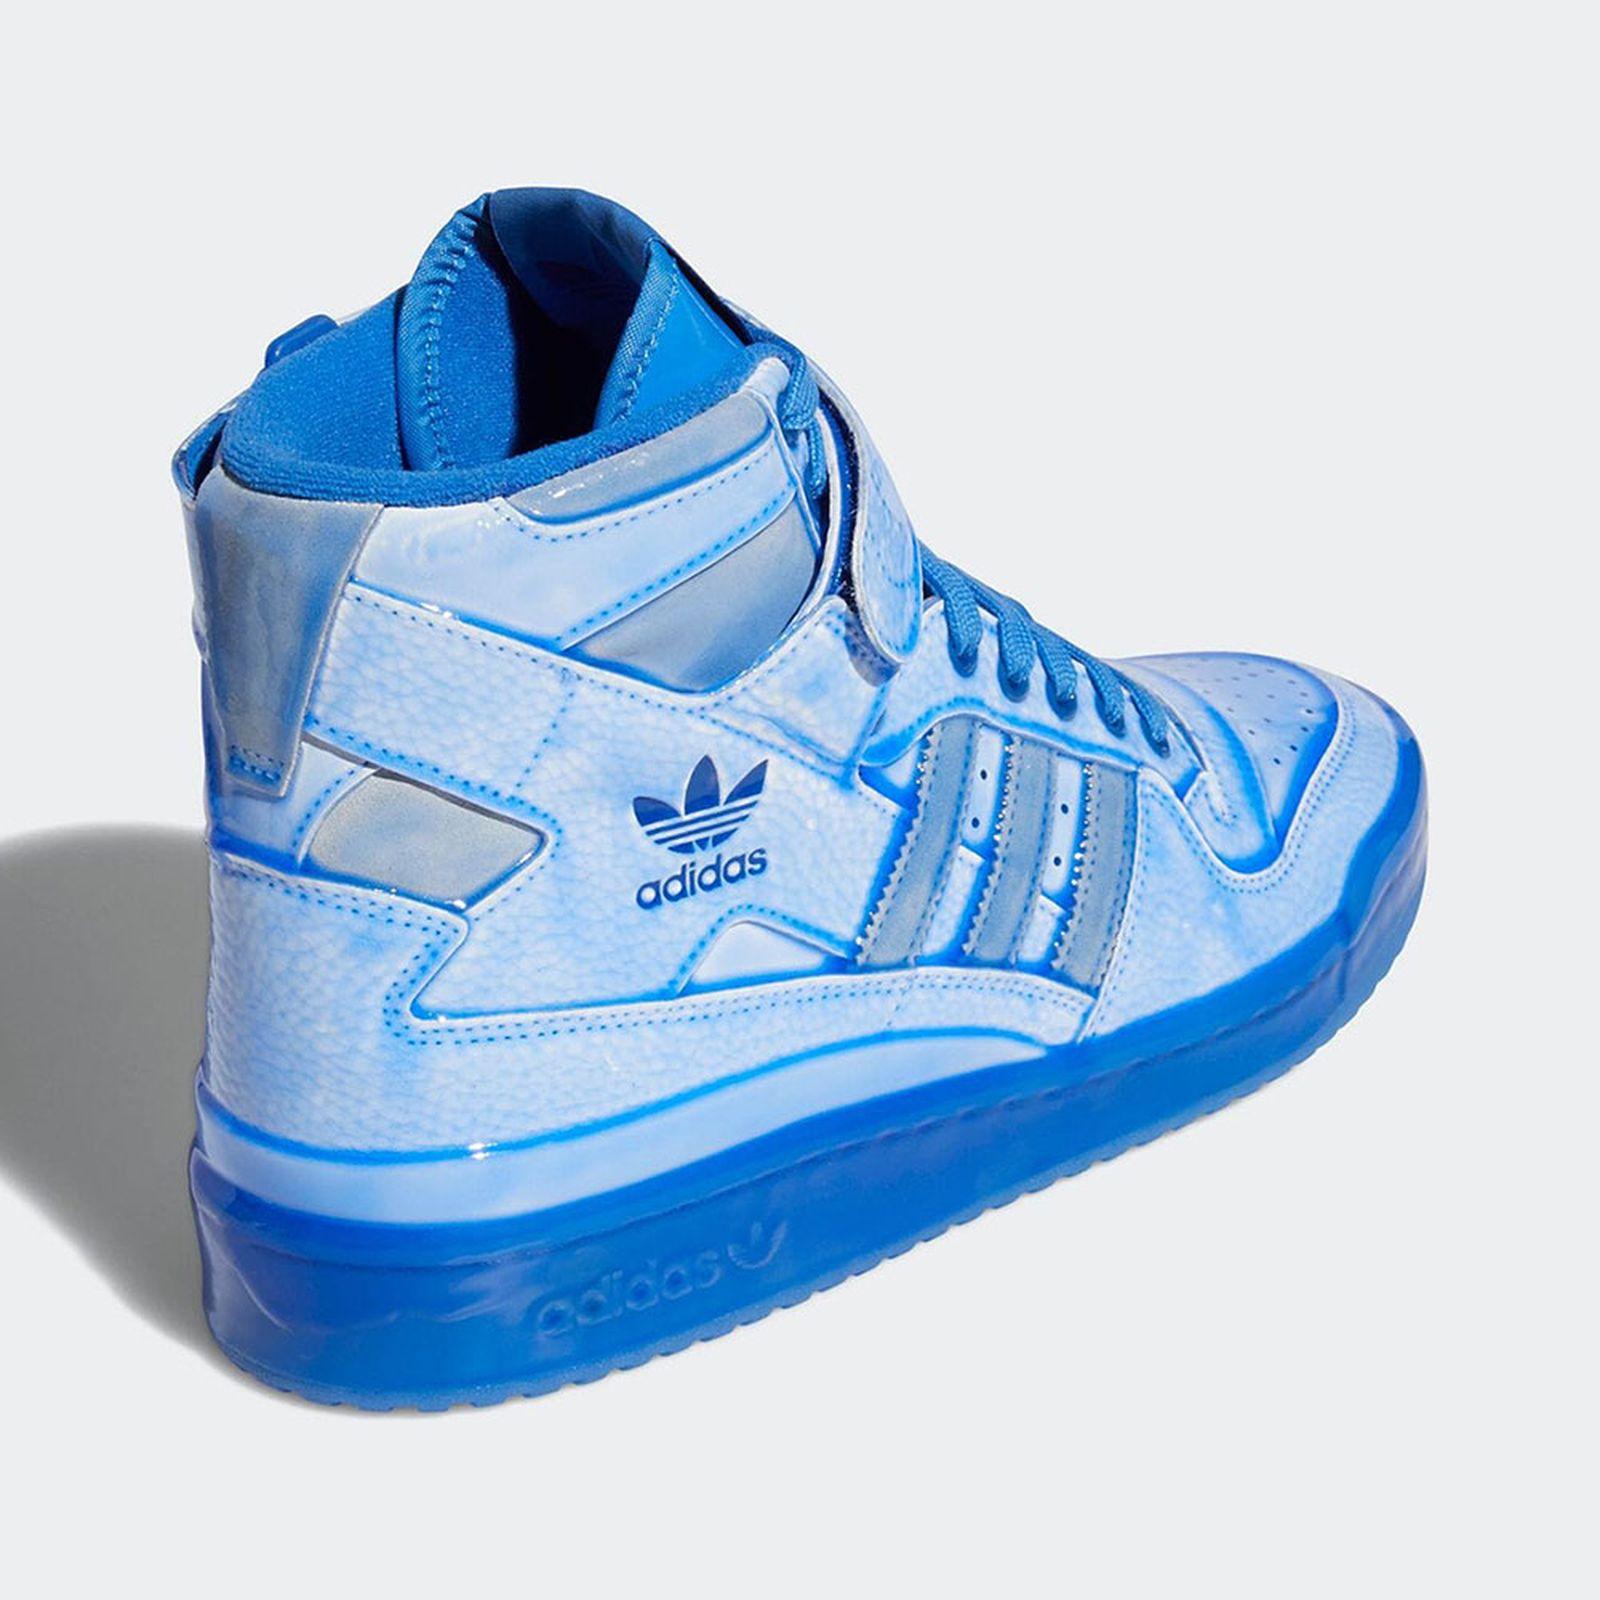 jeremy-scott-adidas-forum-hi-release-date-price-15